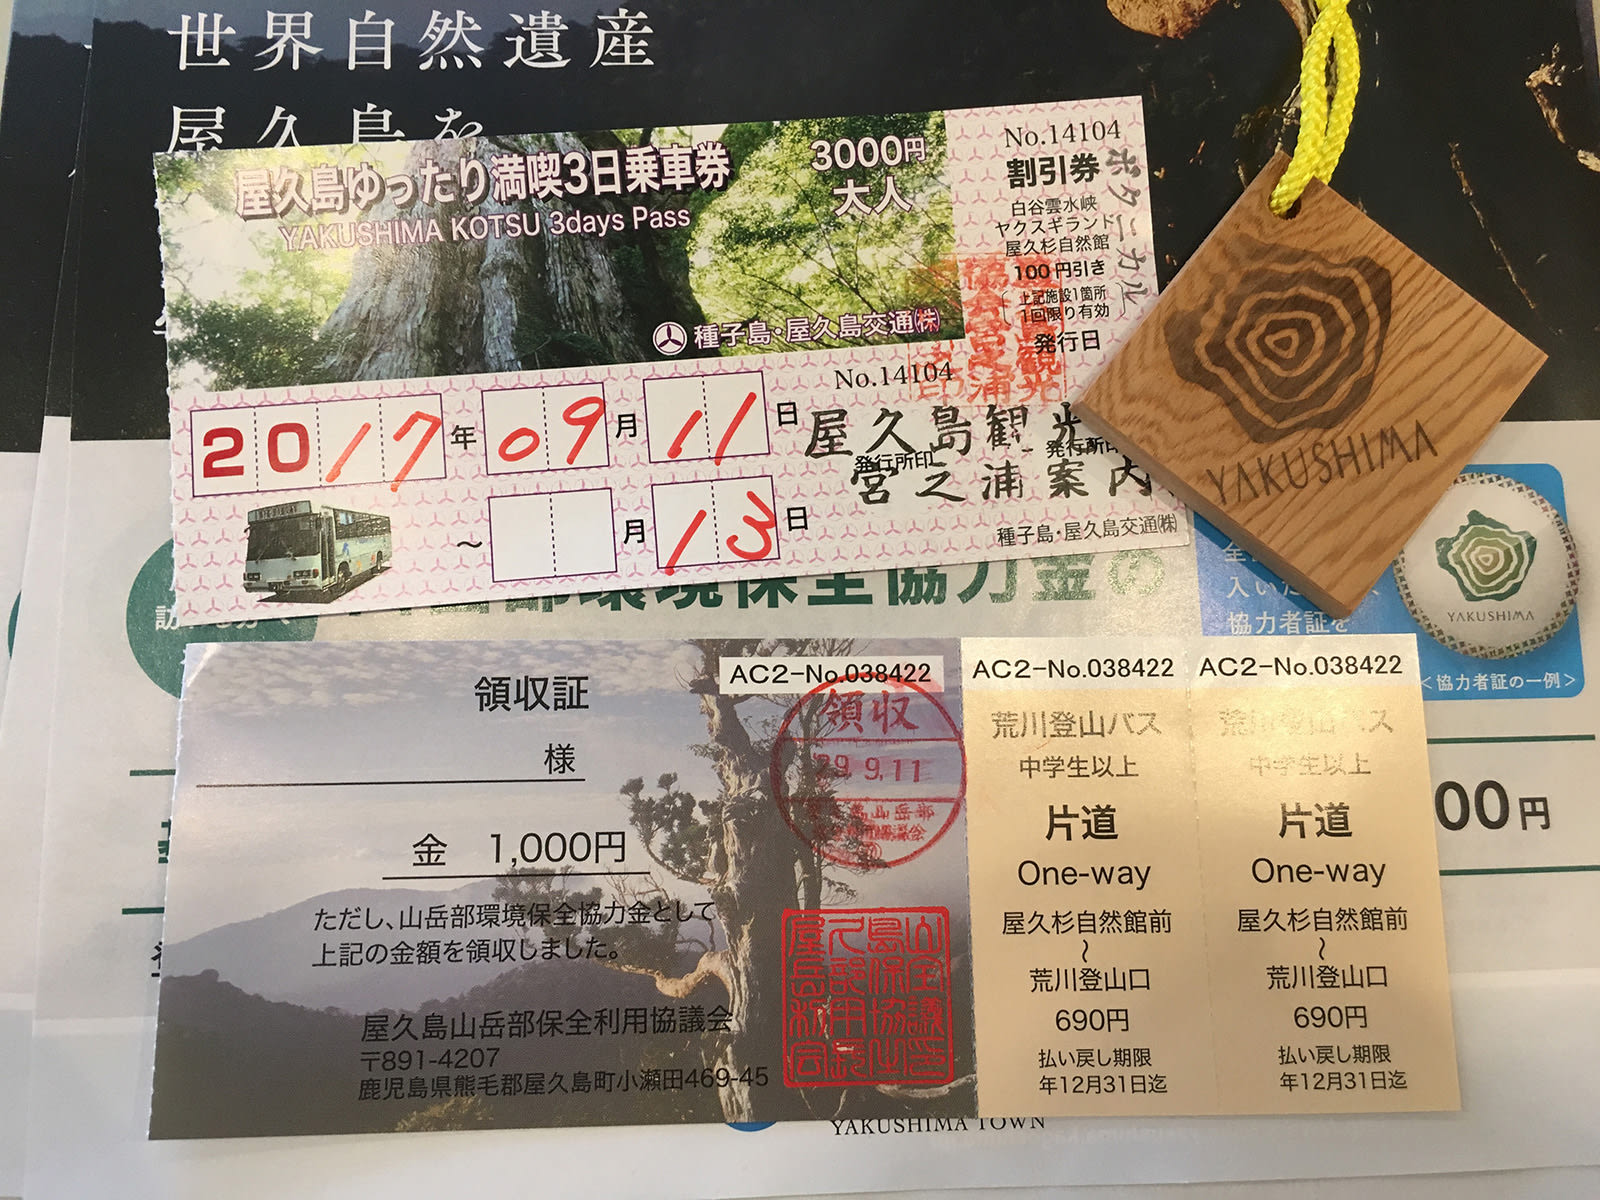 du lịch yakushima - vé xe buýt yakushima kotsu